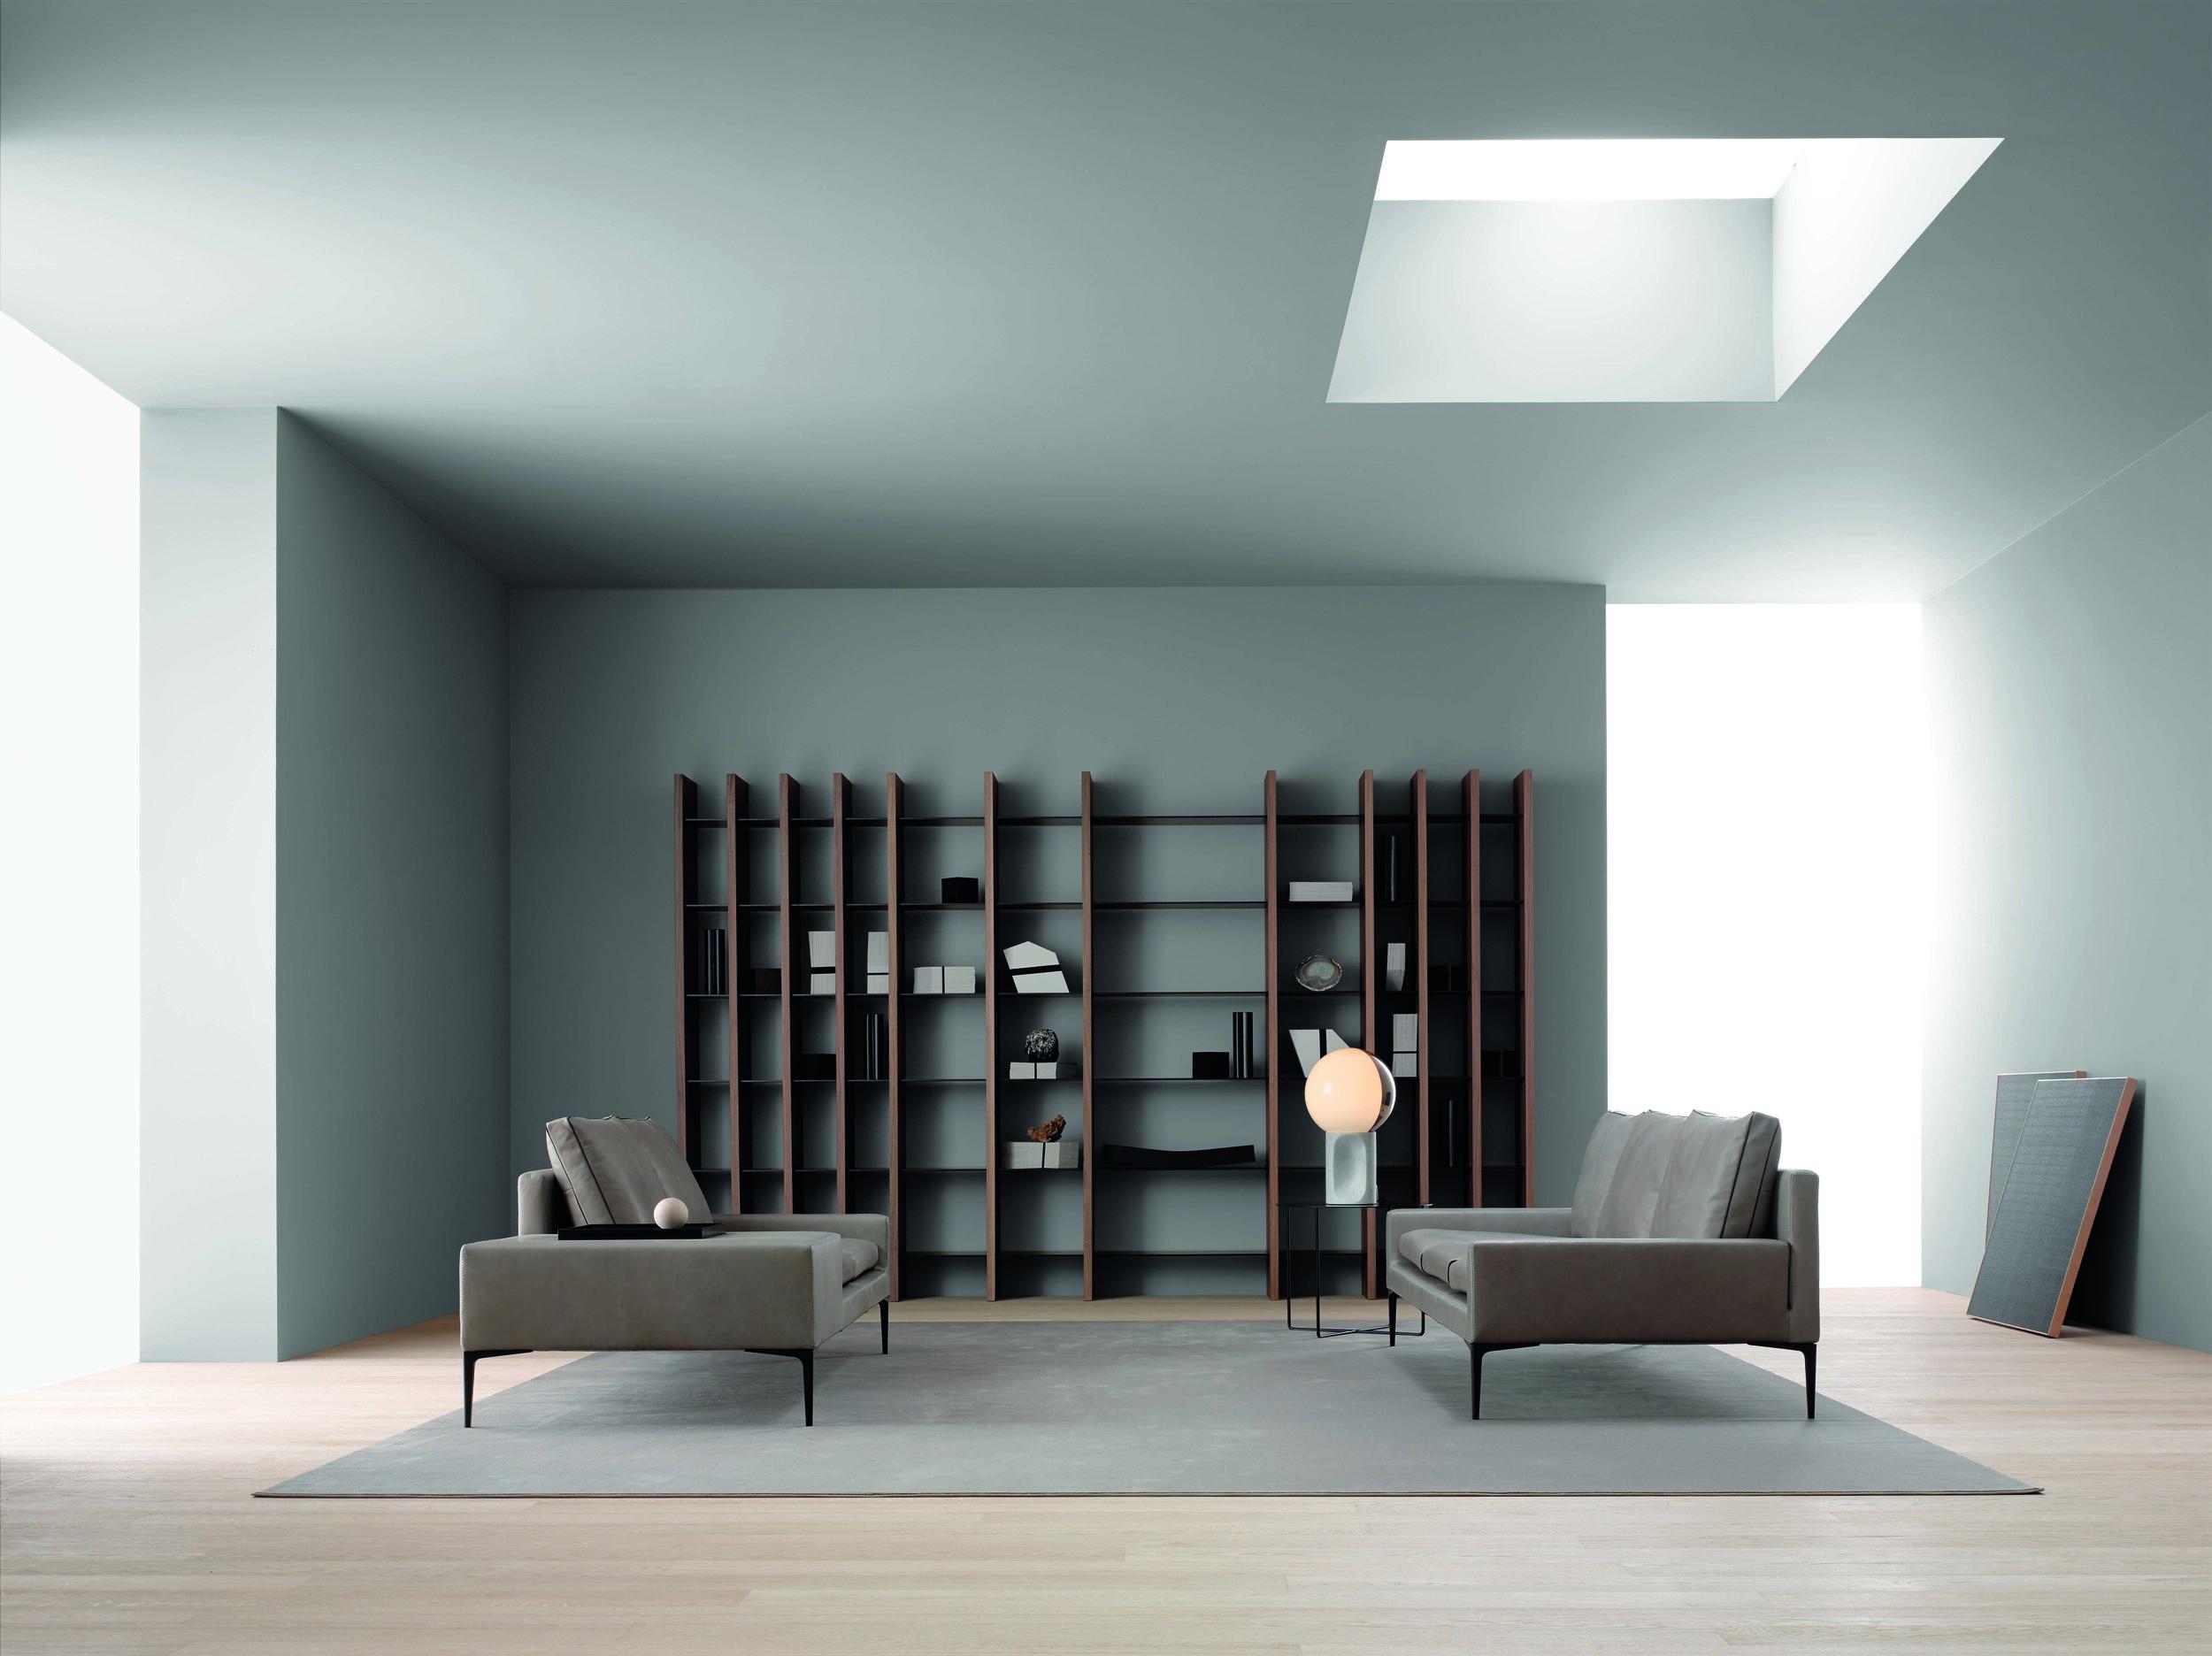 01_Parere_Bookcase + Elsa_Sofa.jpg